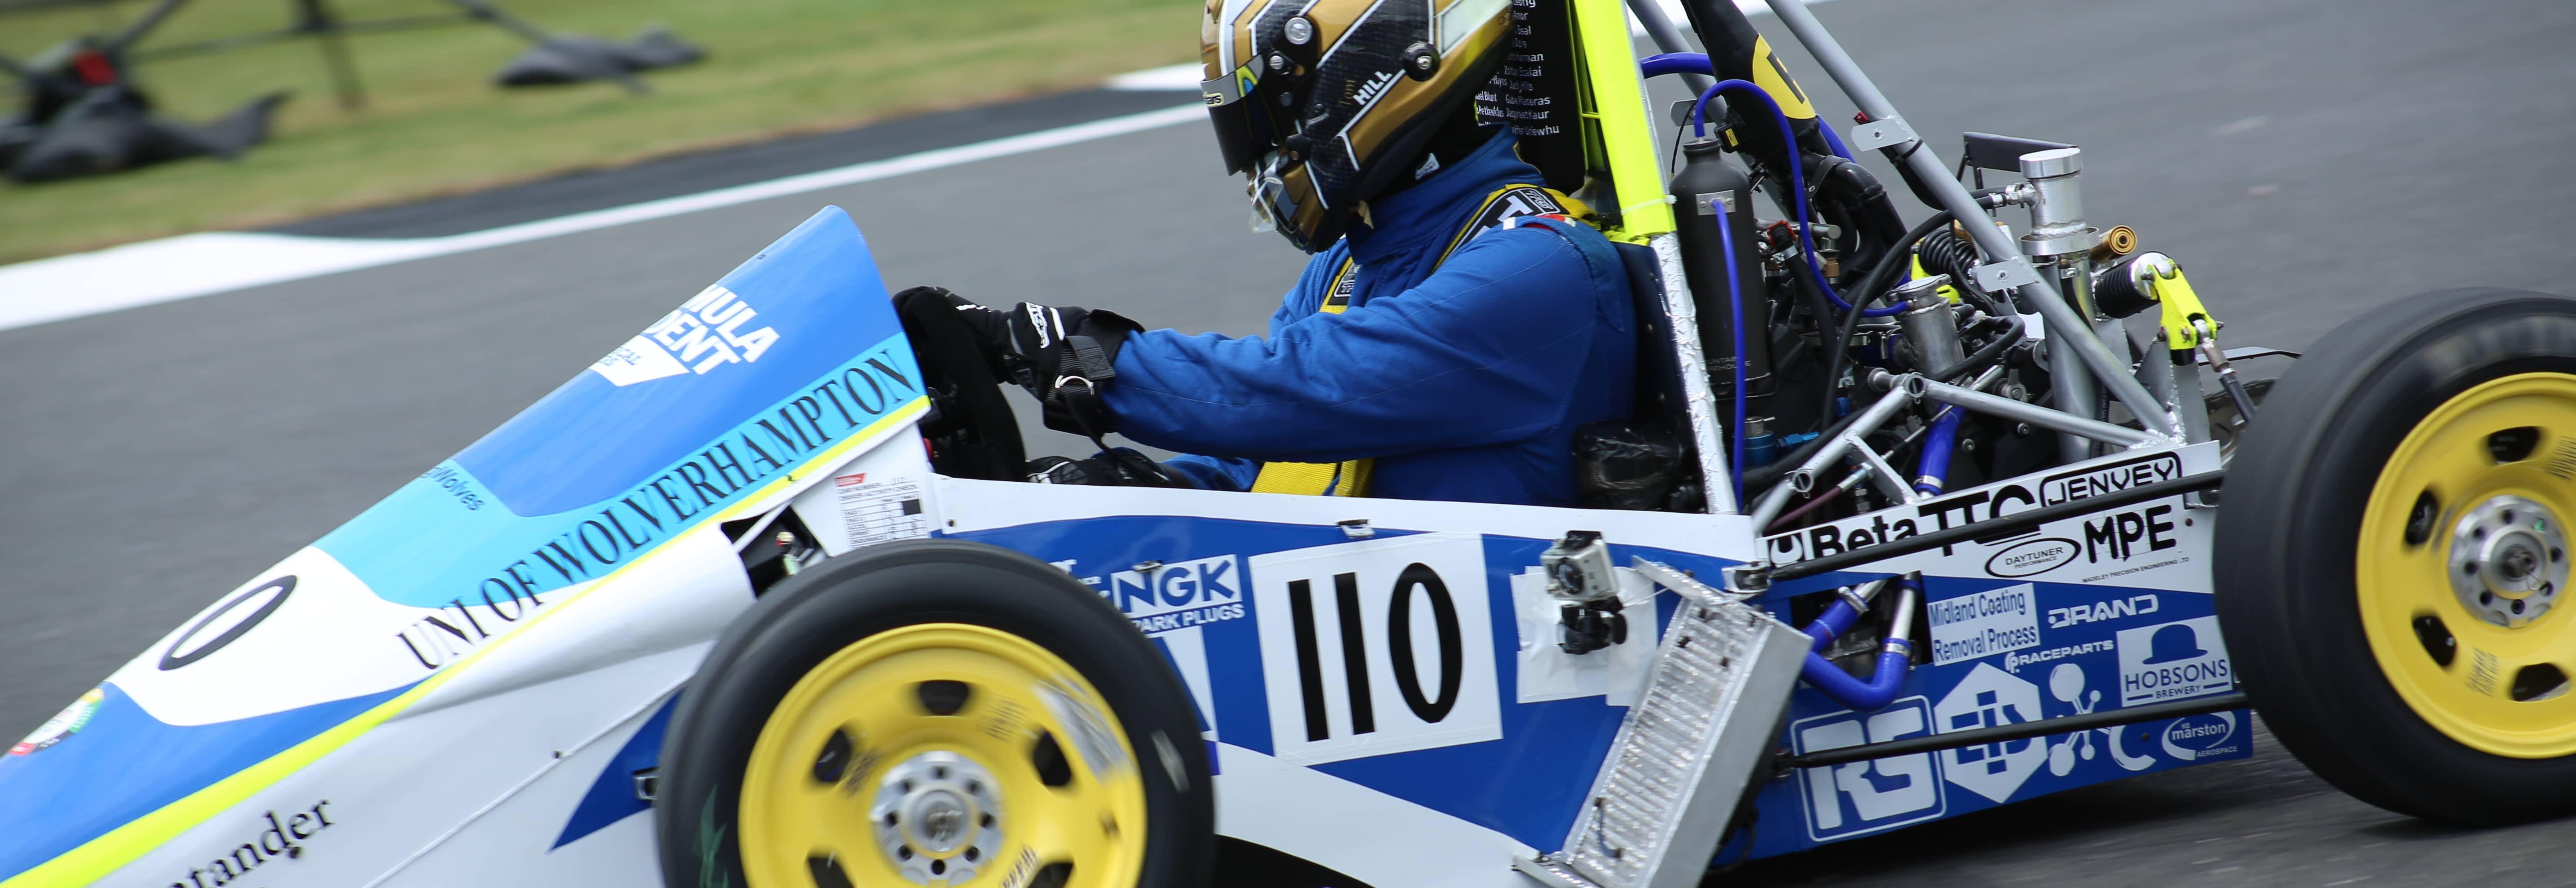 Formula Student - University of Wolverhampton